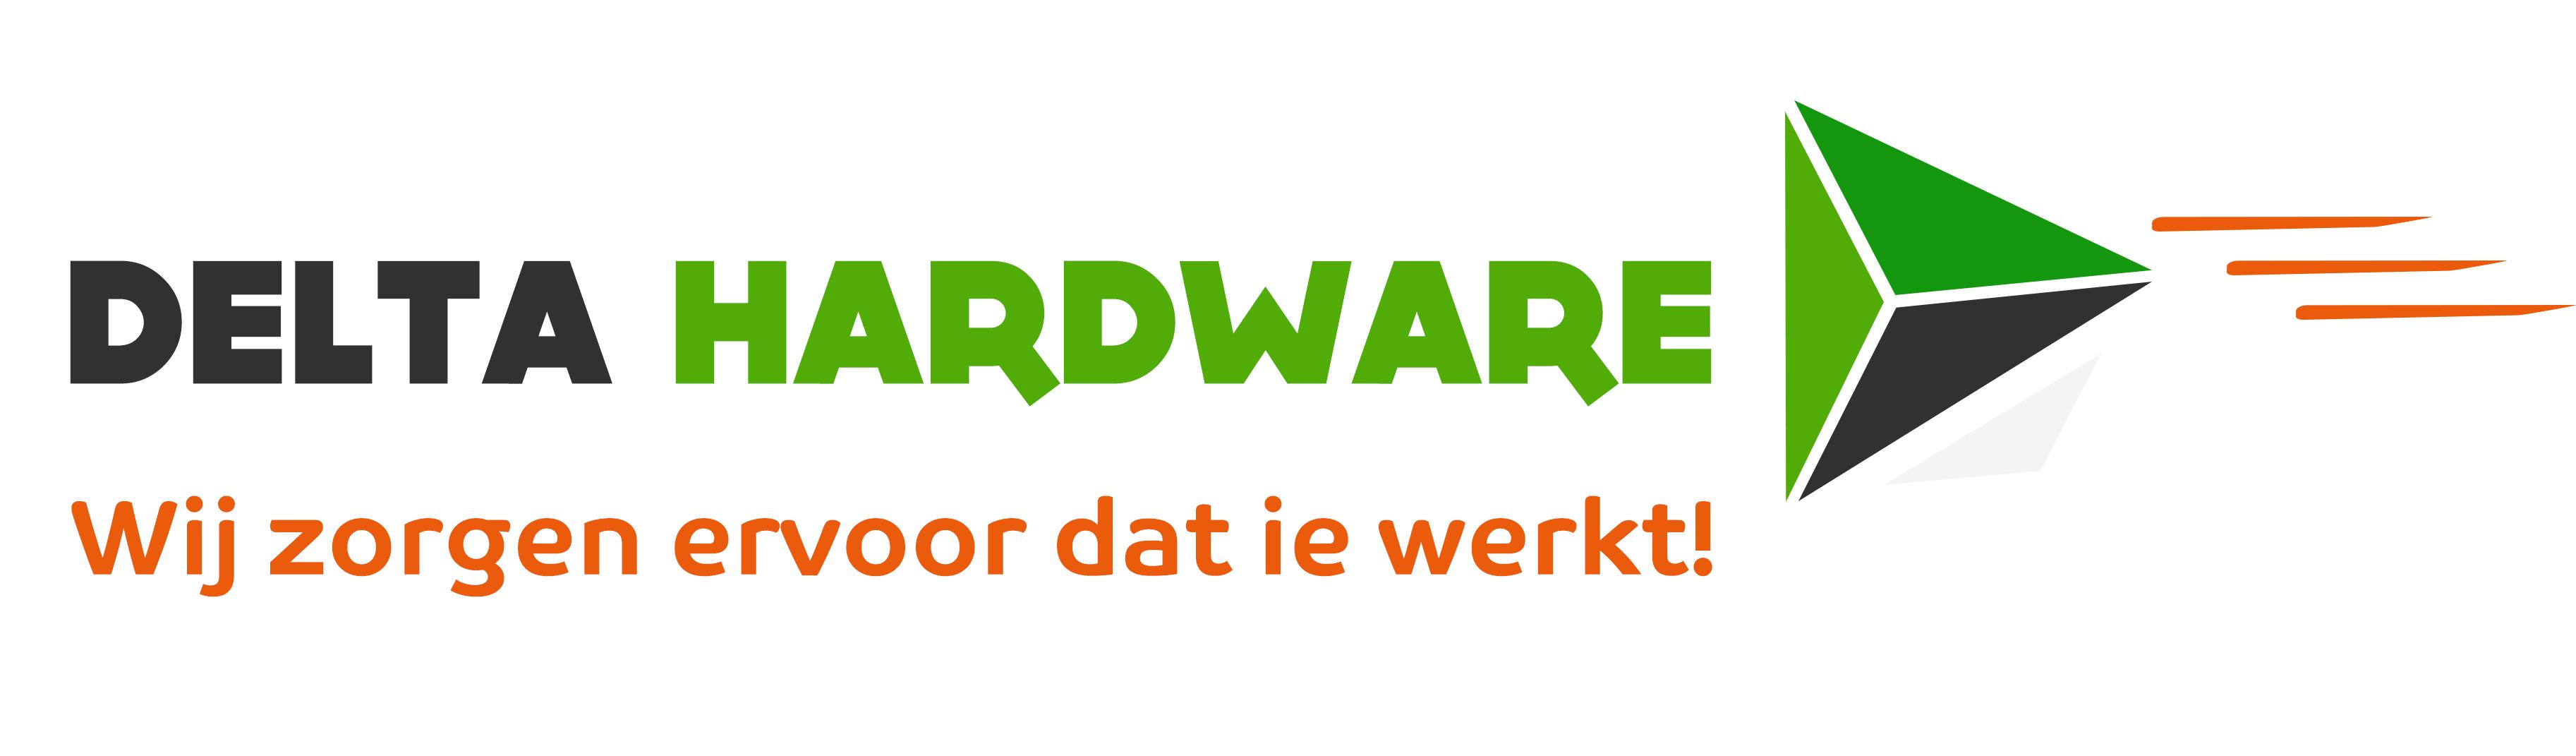 Delta Hardware